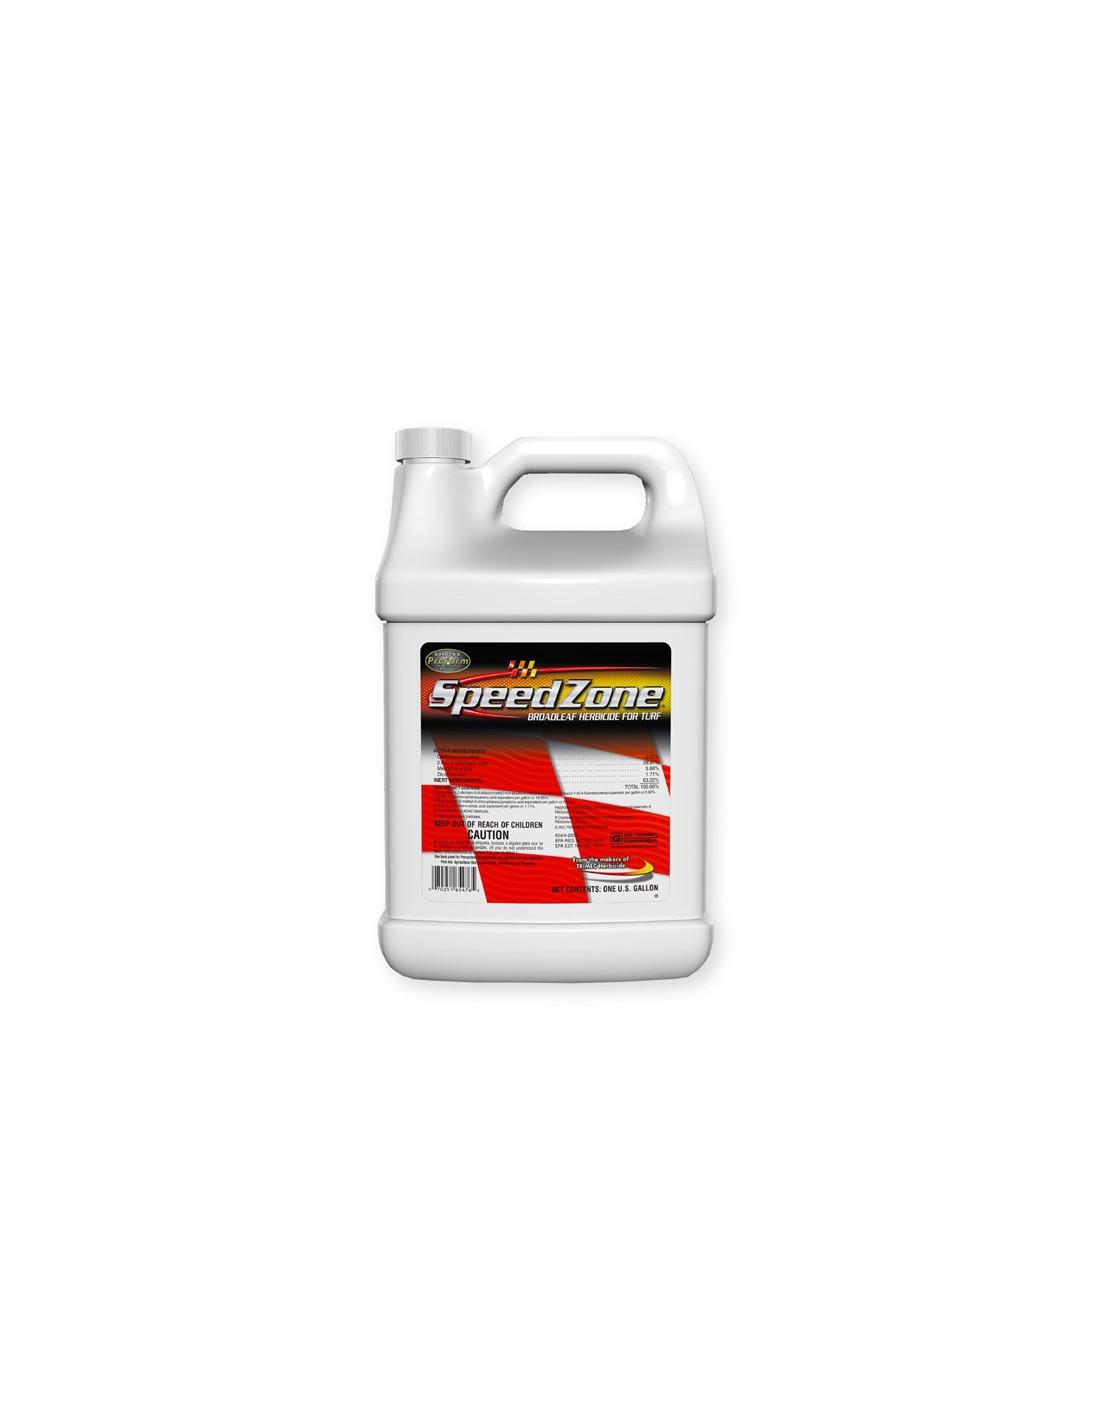 SpeedZone Broadleaf Herbicide for Turf